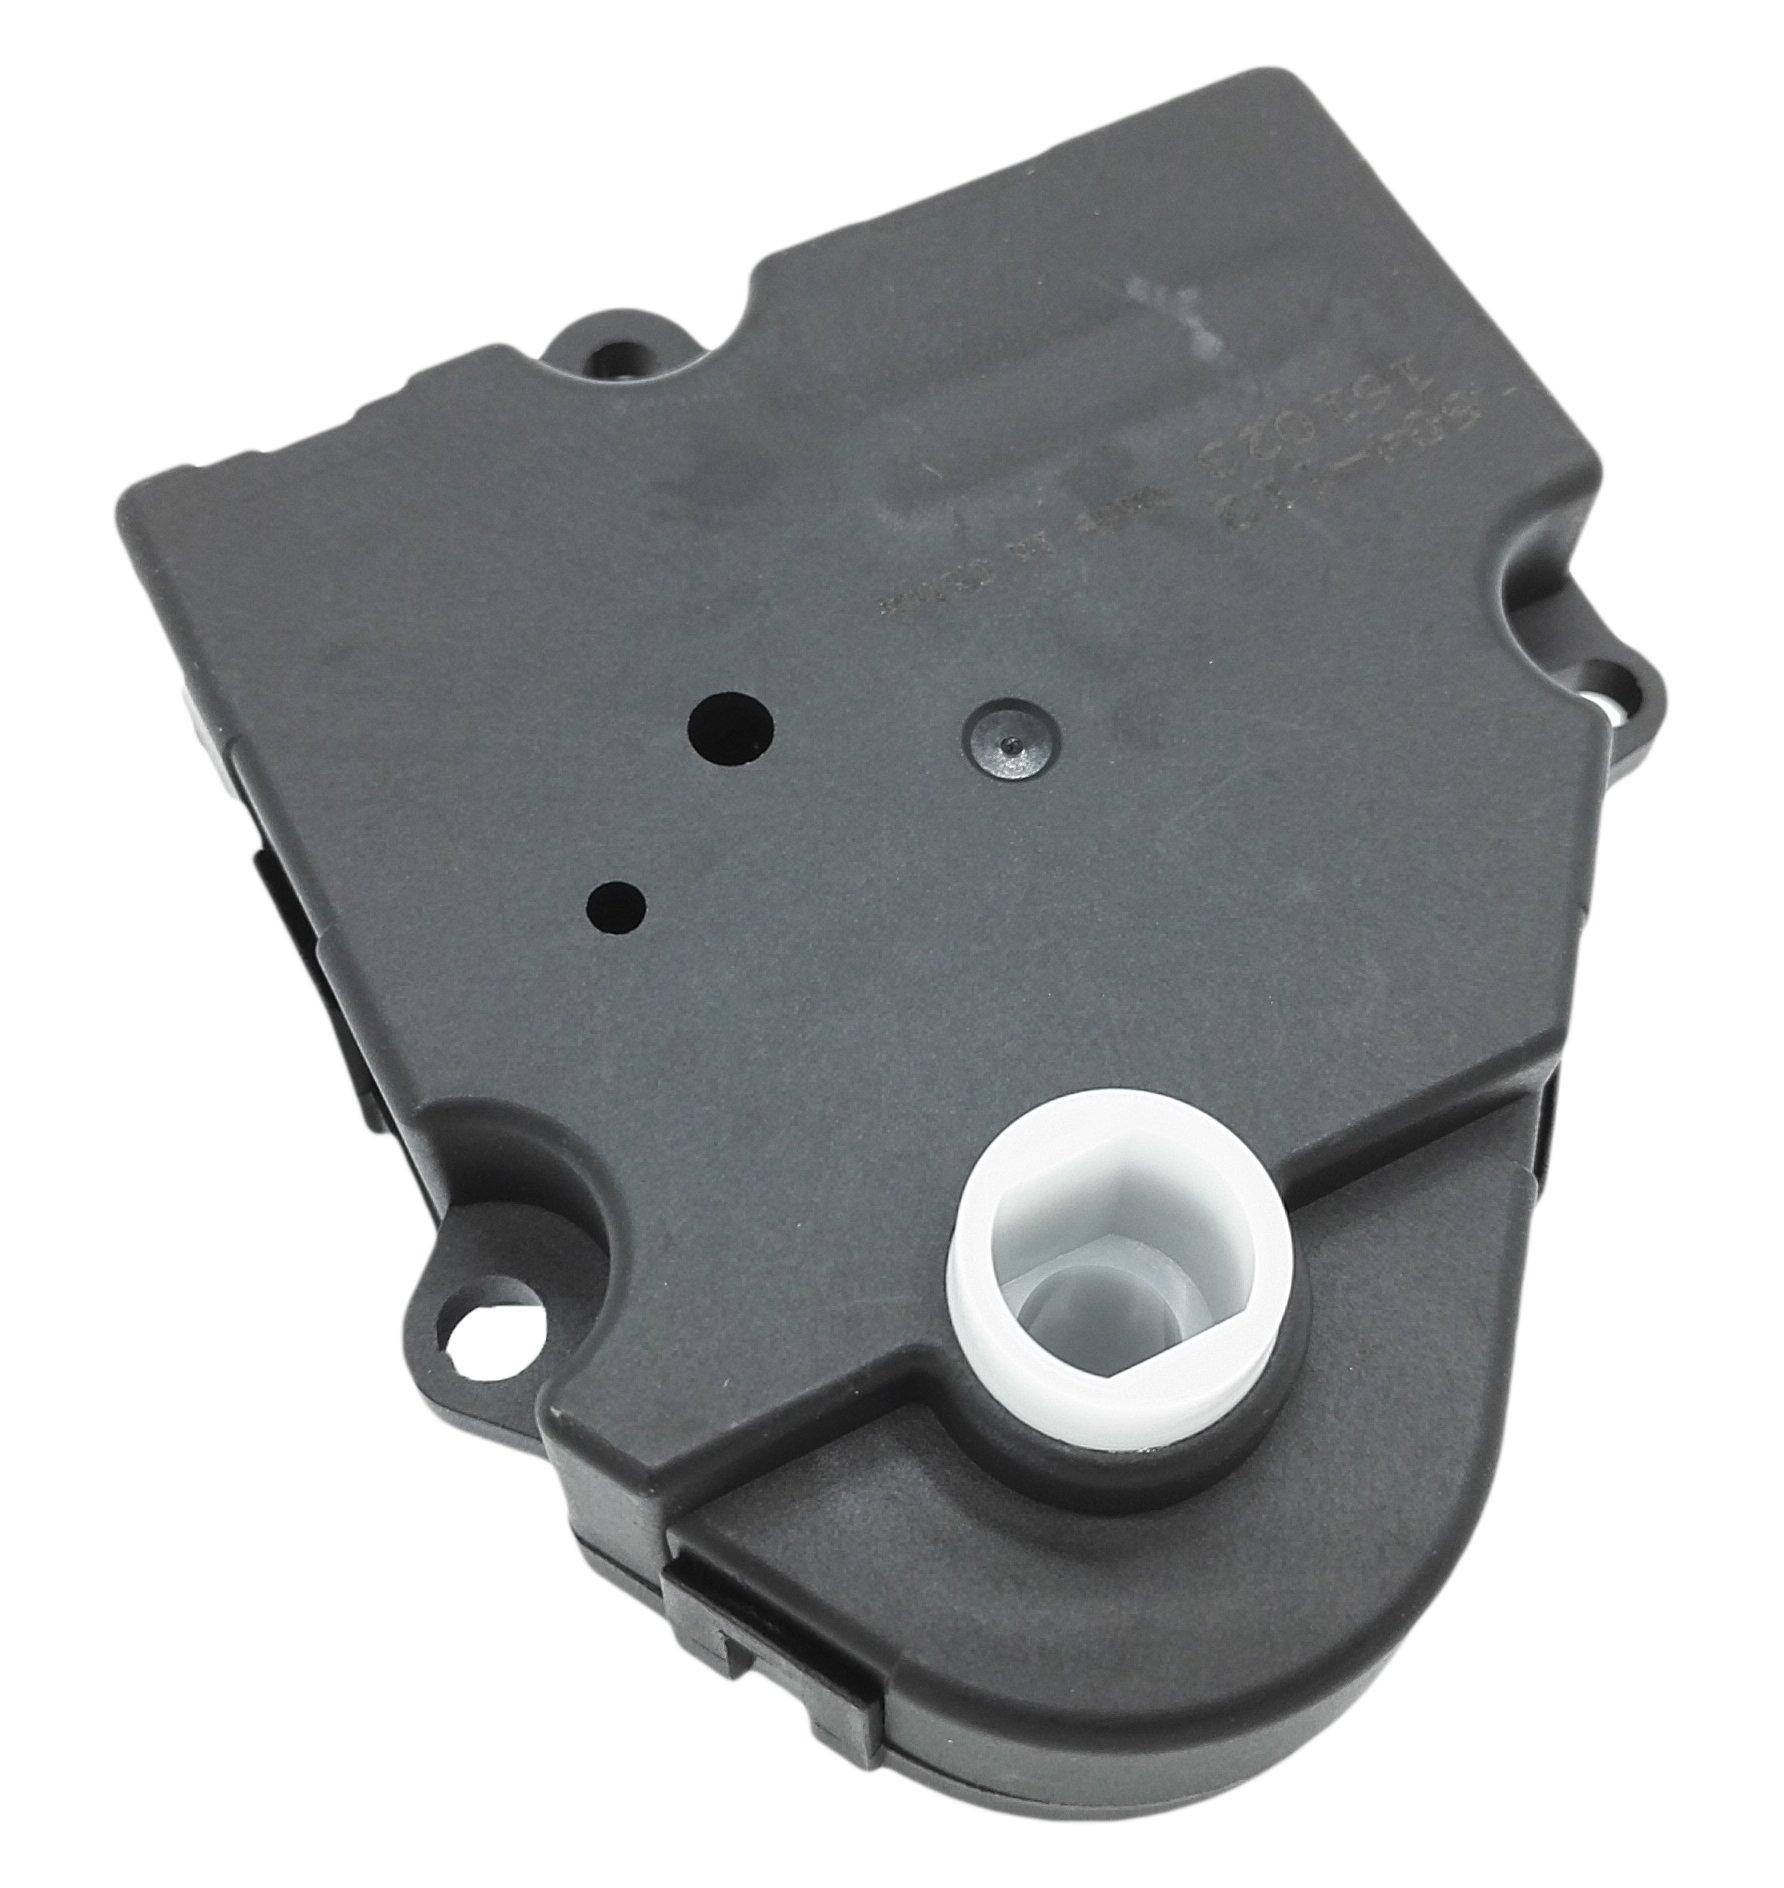 HVAC Heater Blend Door Actuator for 03-14 Cadillac Chevrolet GMC 08-09 Hummer